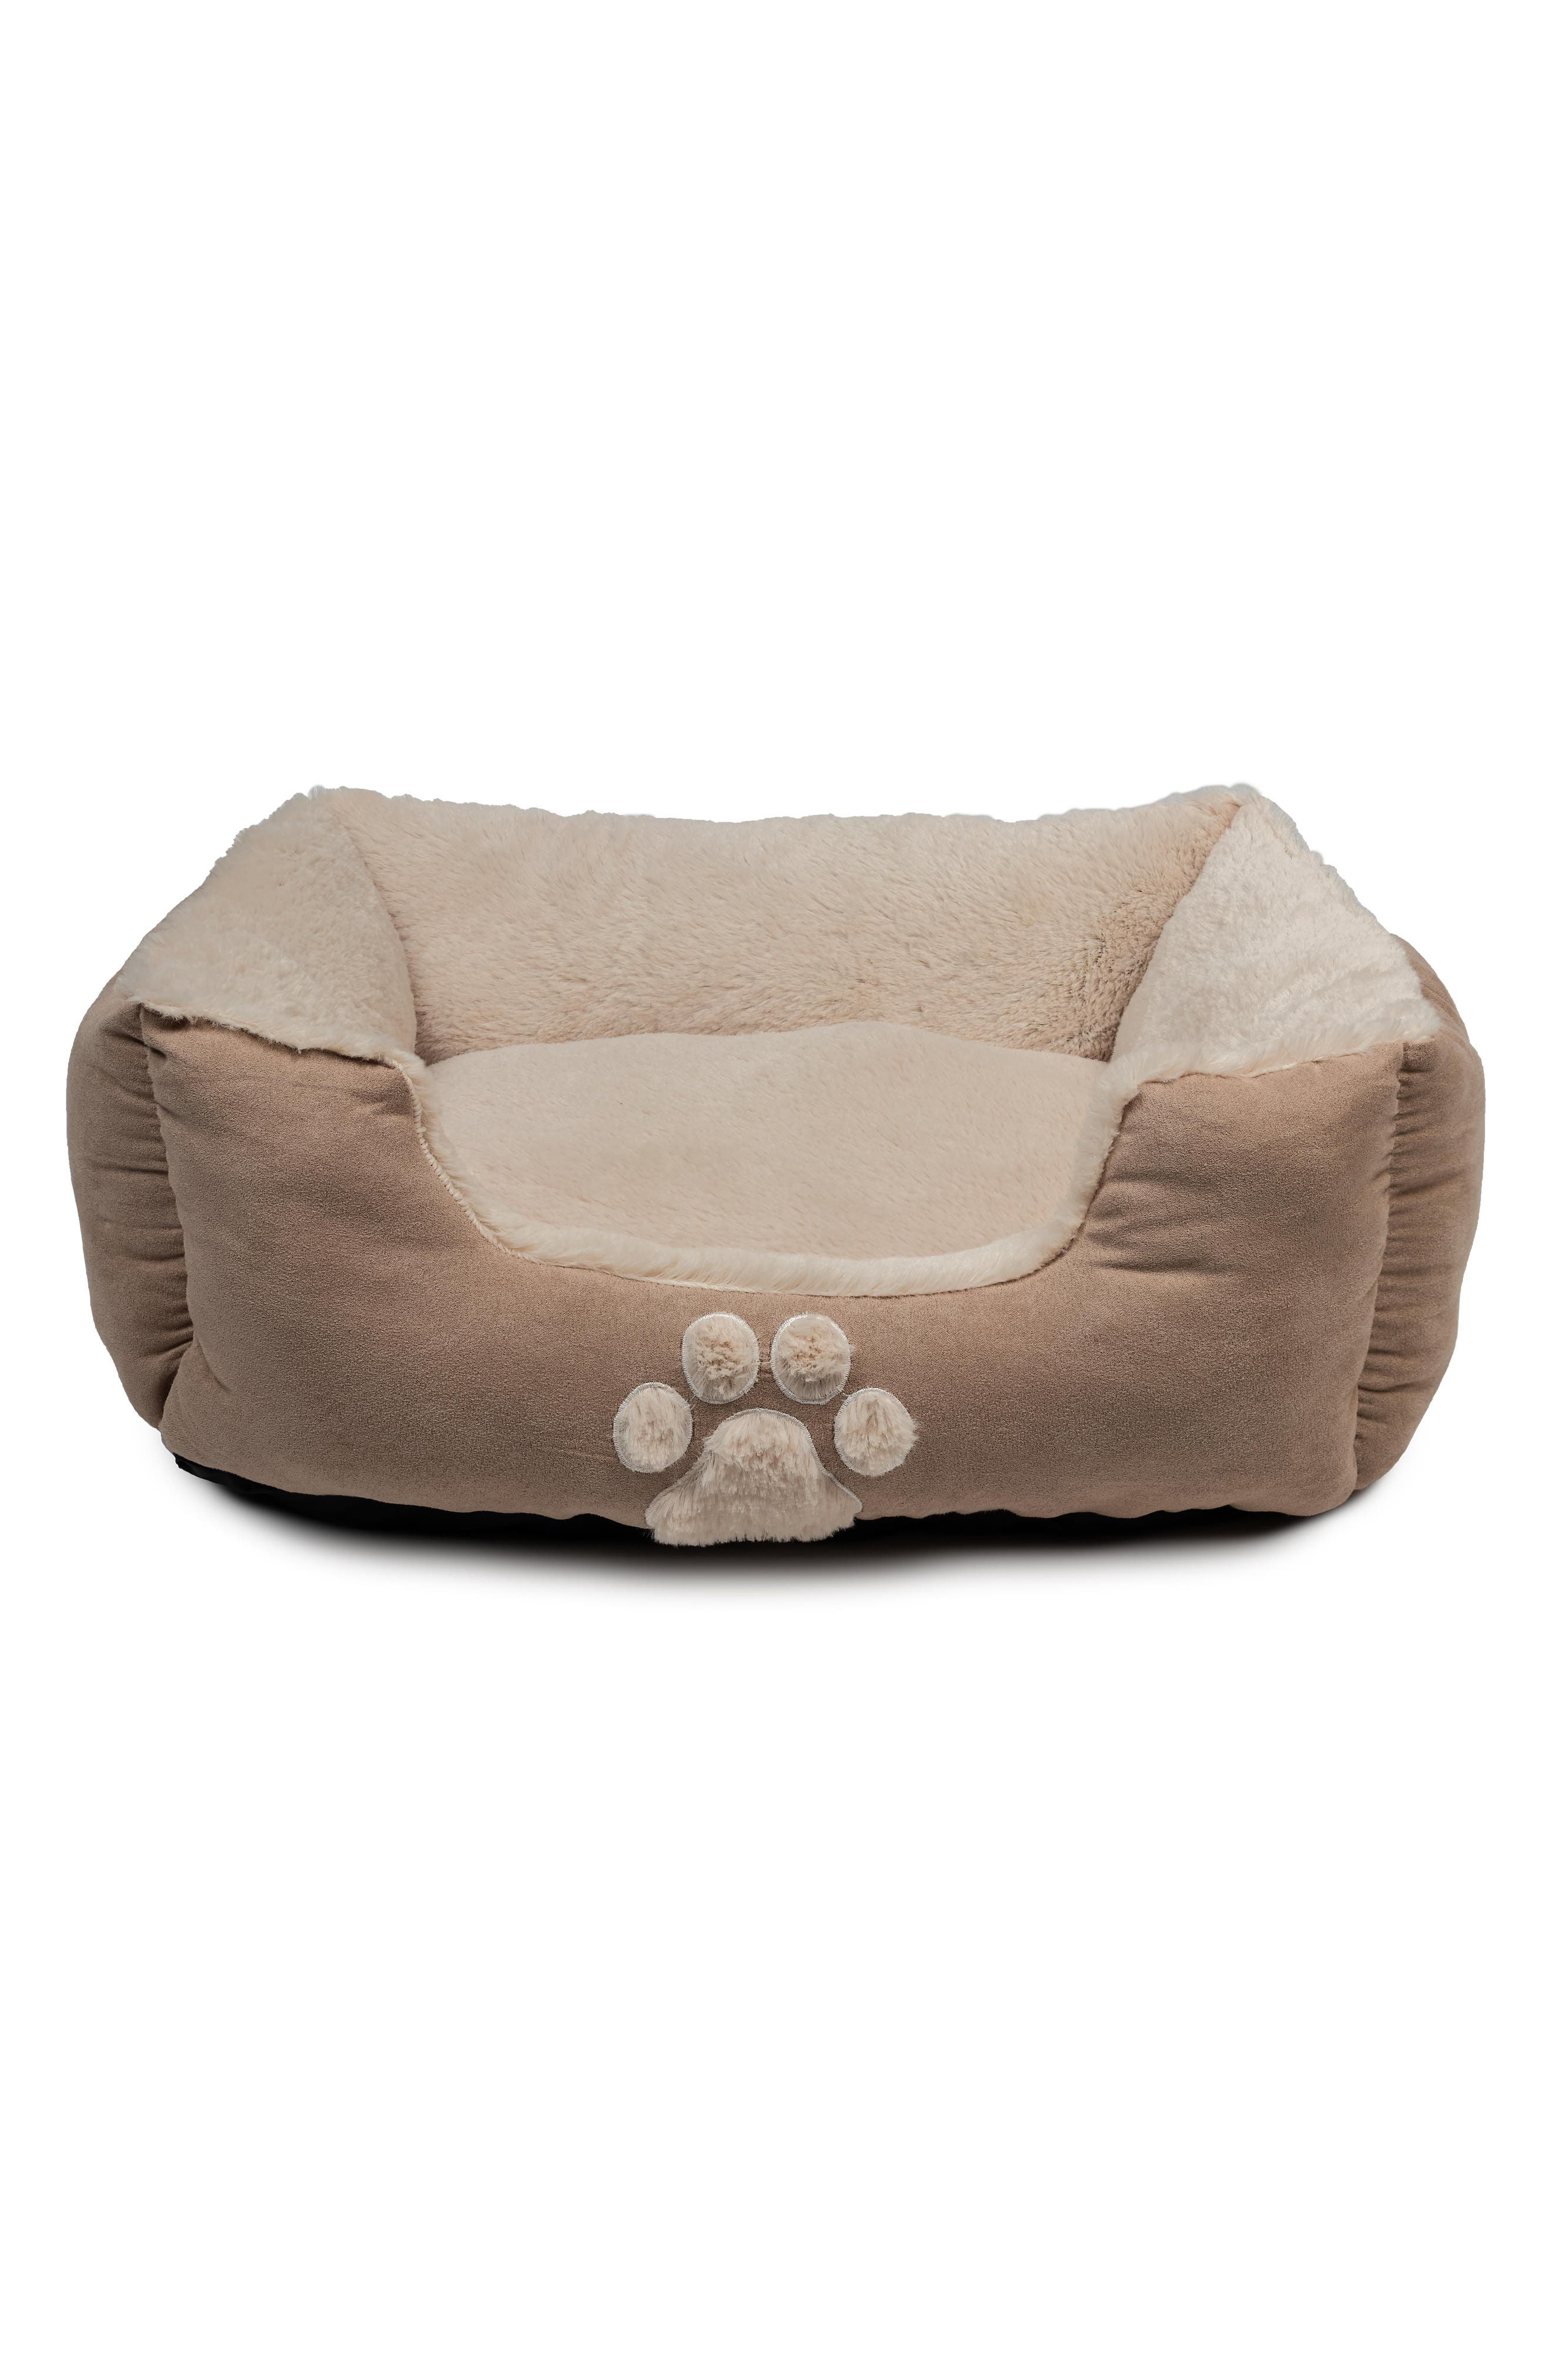 Roxi Square Pet Bed,                             Main thumbnail 1, color,                             Taupe